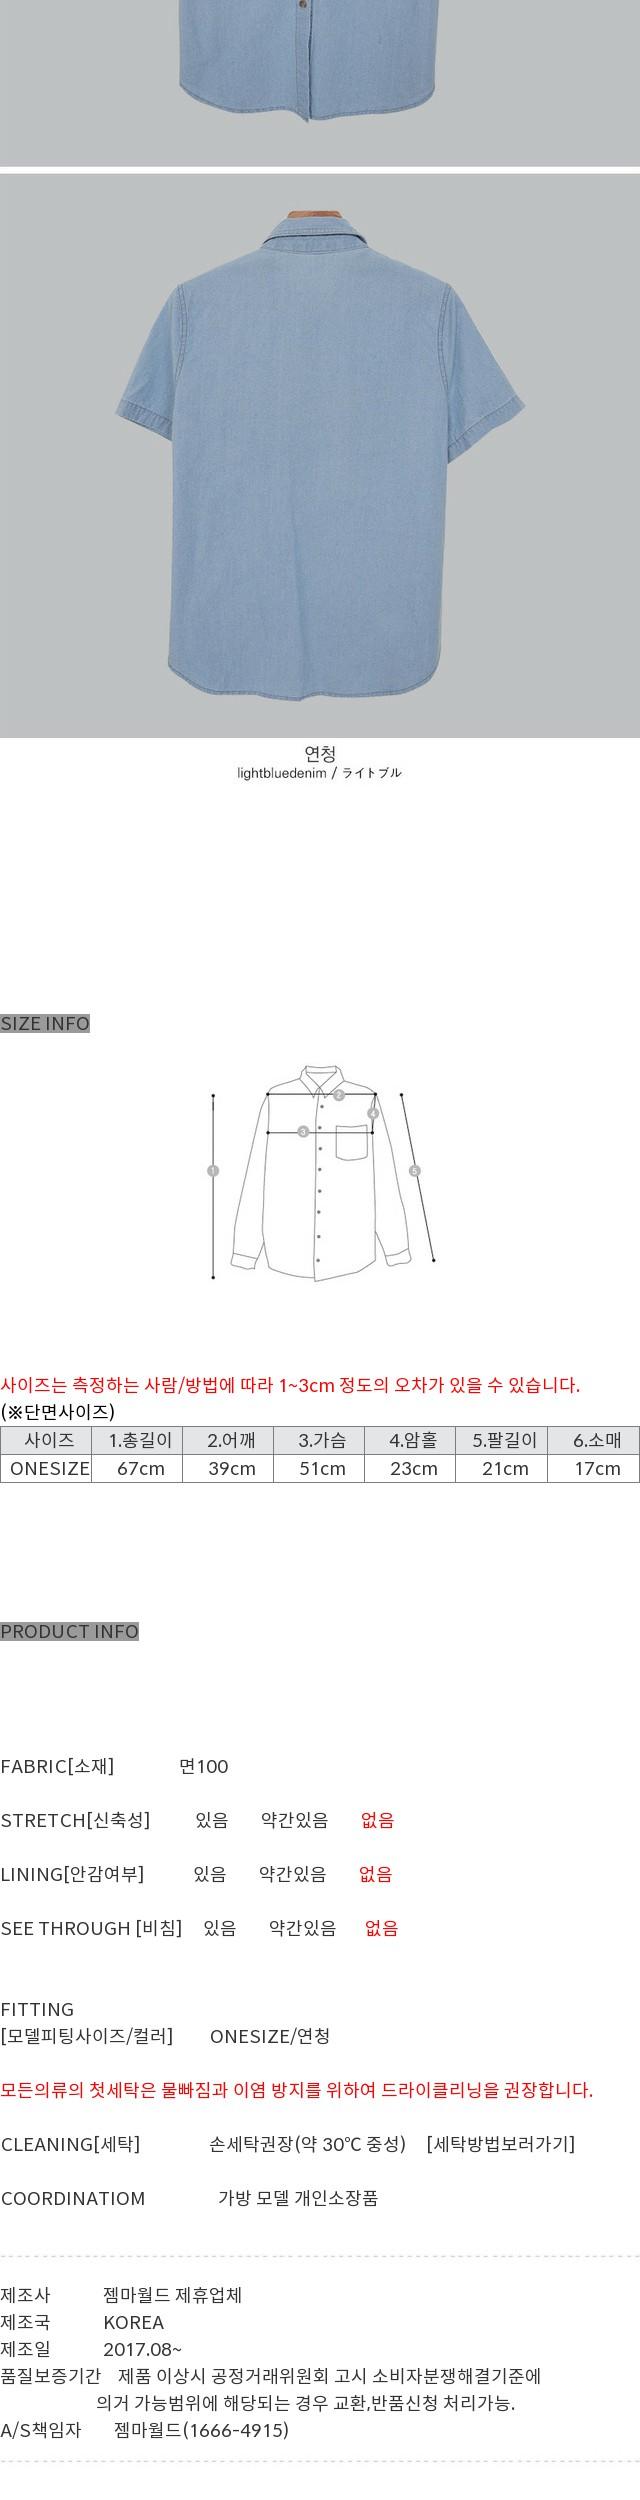 Sunny-denim shirt